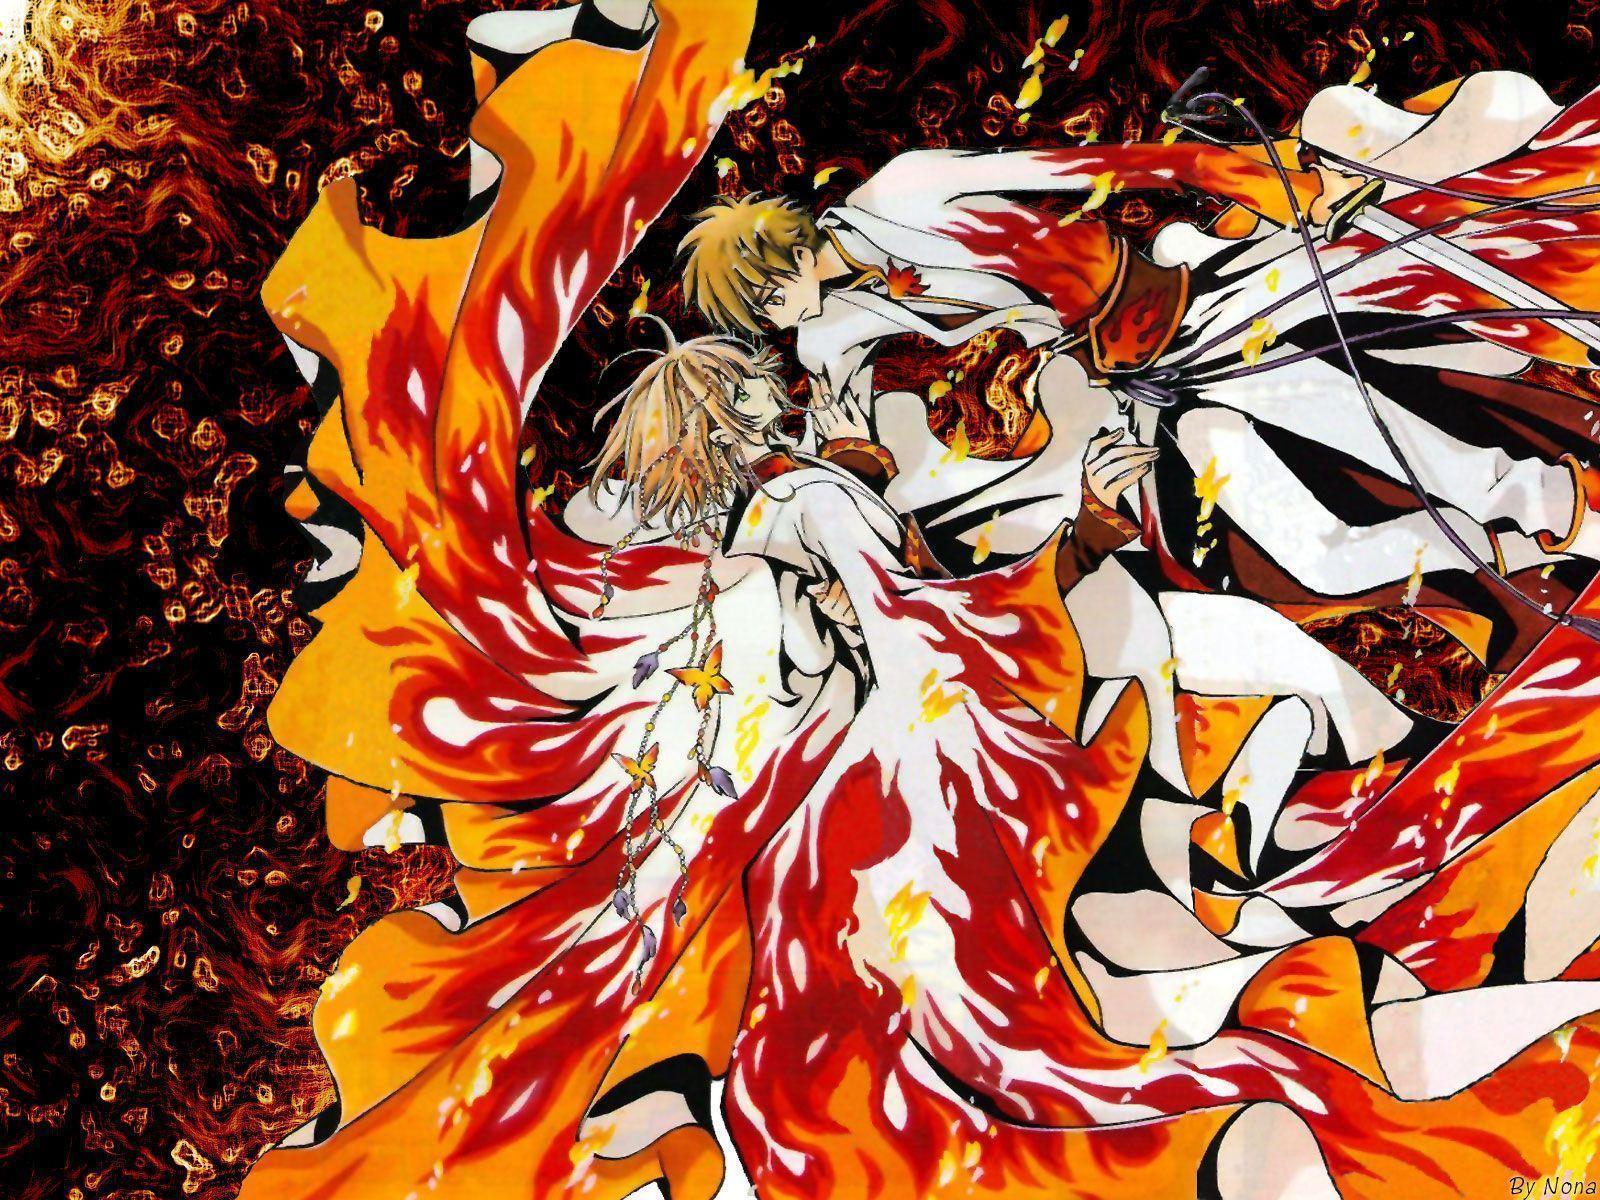 Tsubasa Reservoir Chronicle Wallpaper: A New Journey Begins - Minitokyo